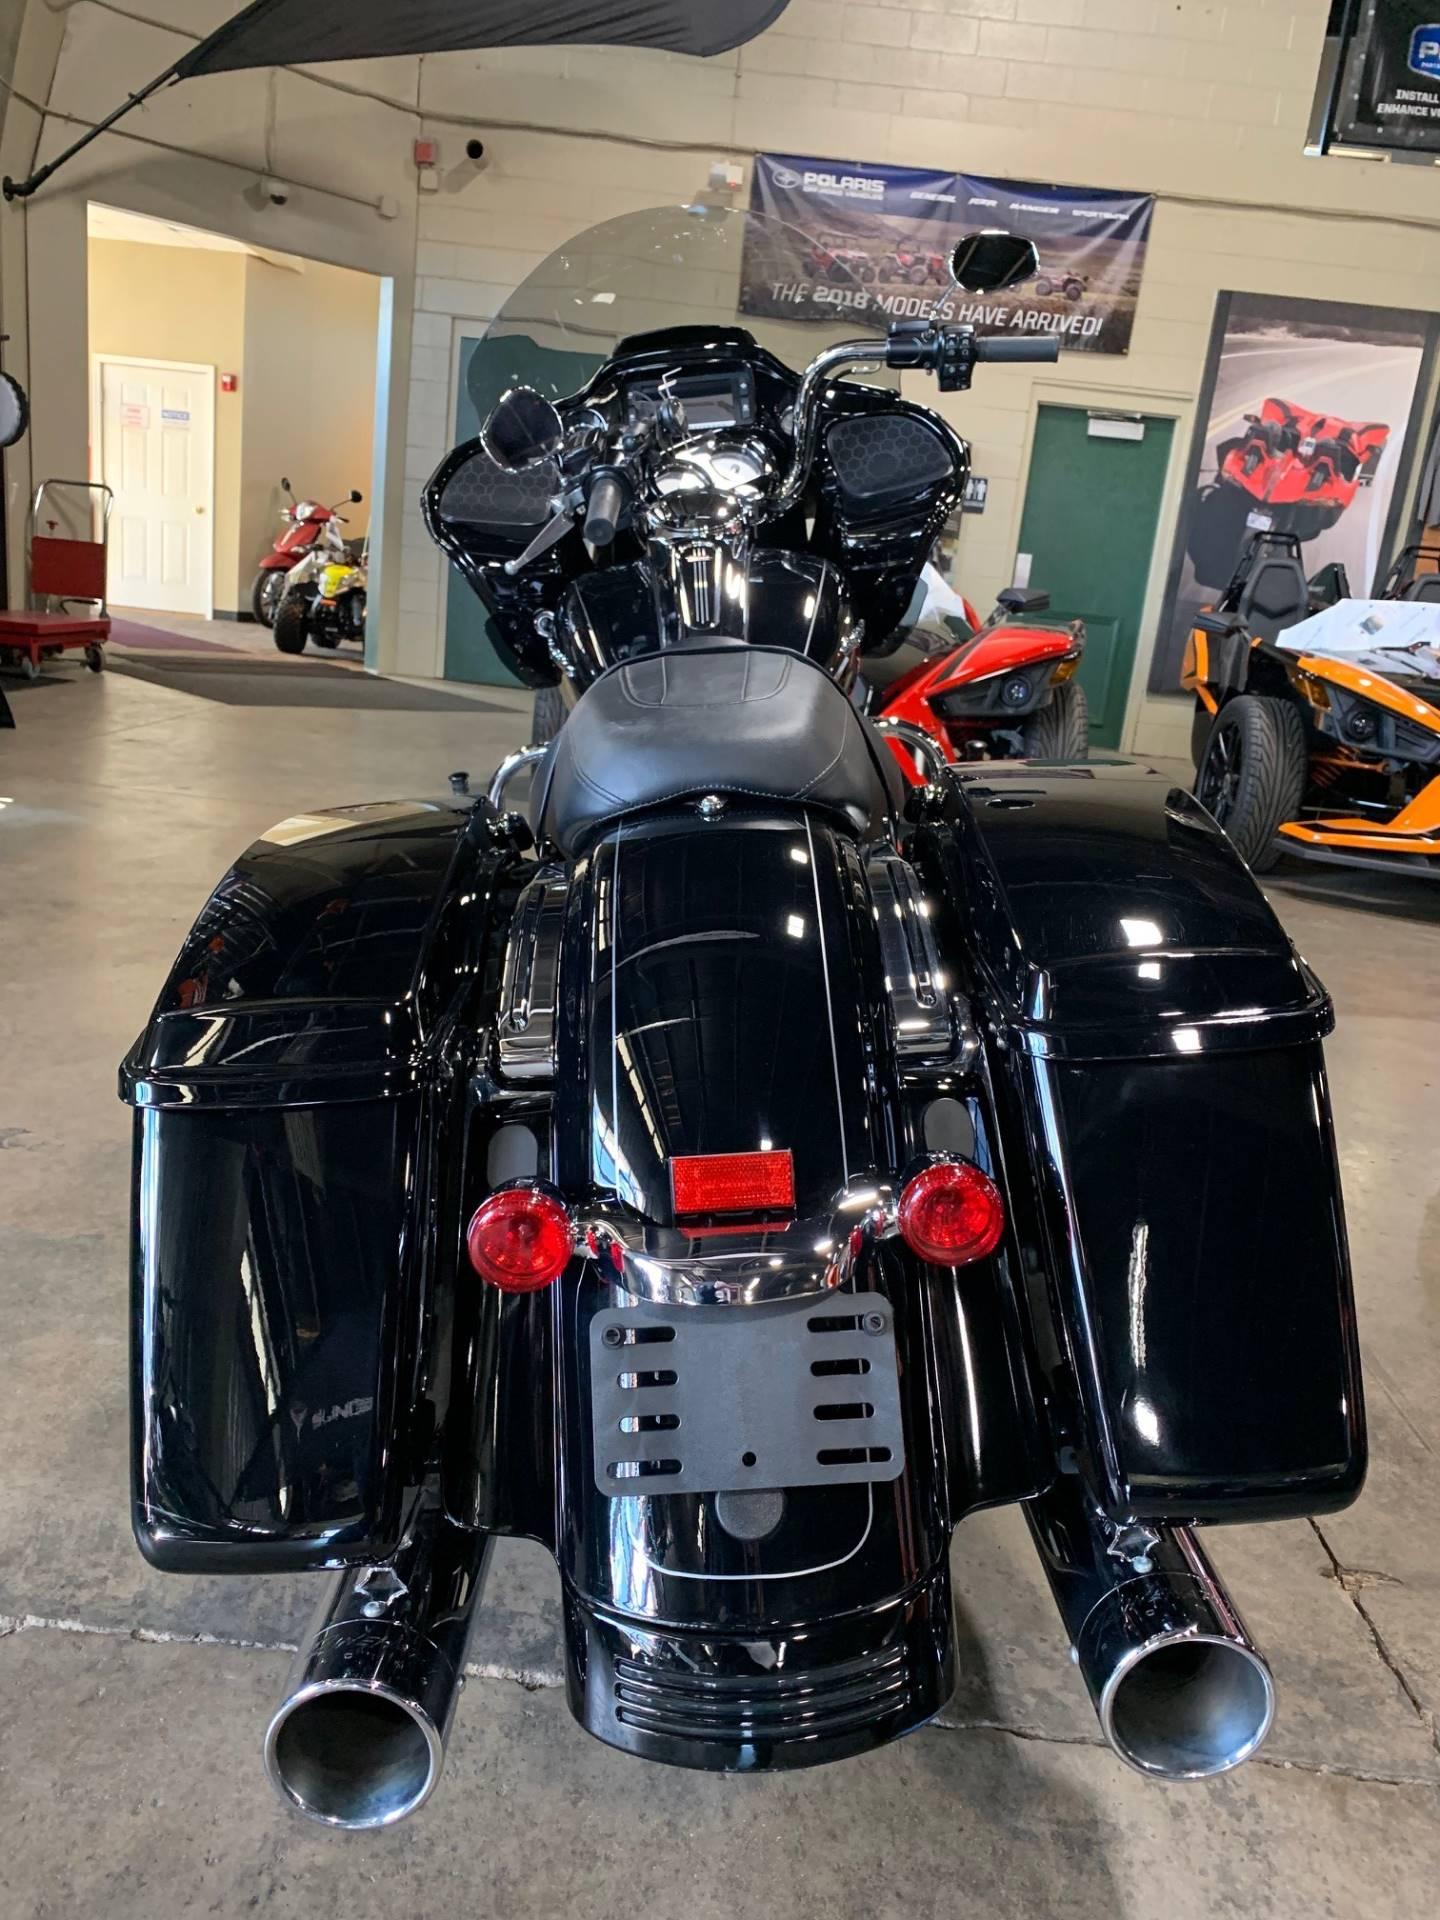 2015 Harley-Davidson ROAD GLIDE SPECIAL 9